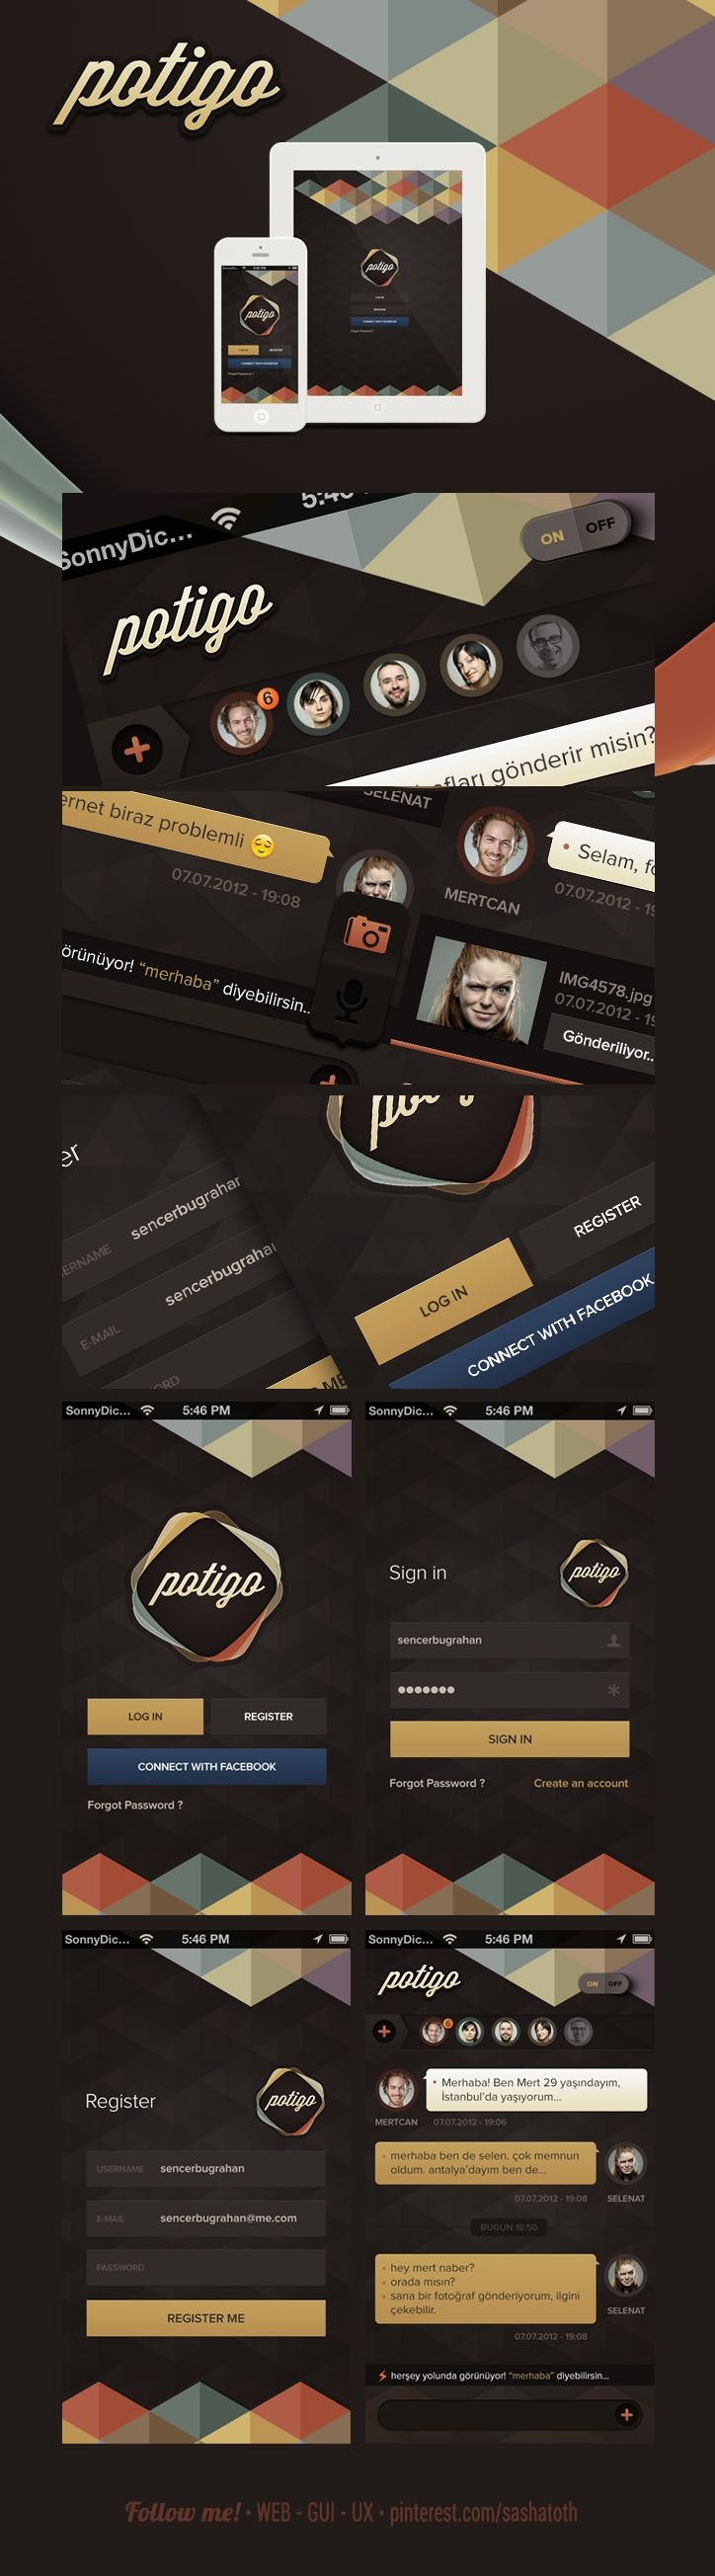 Potigo Chat Application (concept) by Sencer Bugrahan, via Behance #app #gui #ui #behance